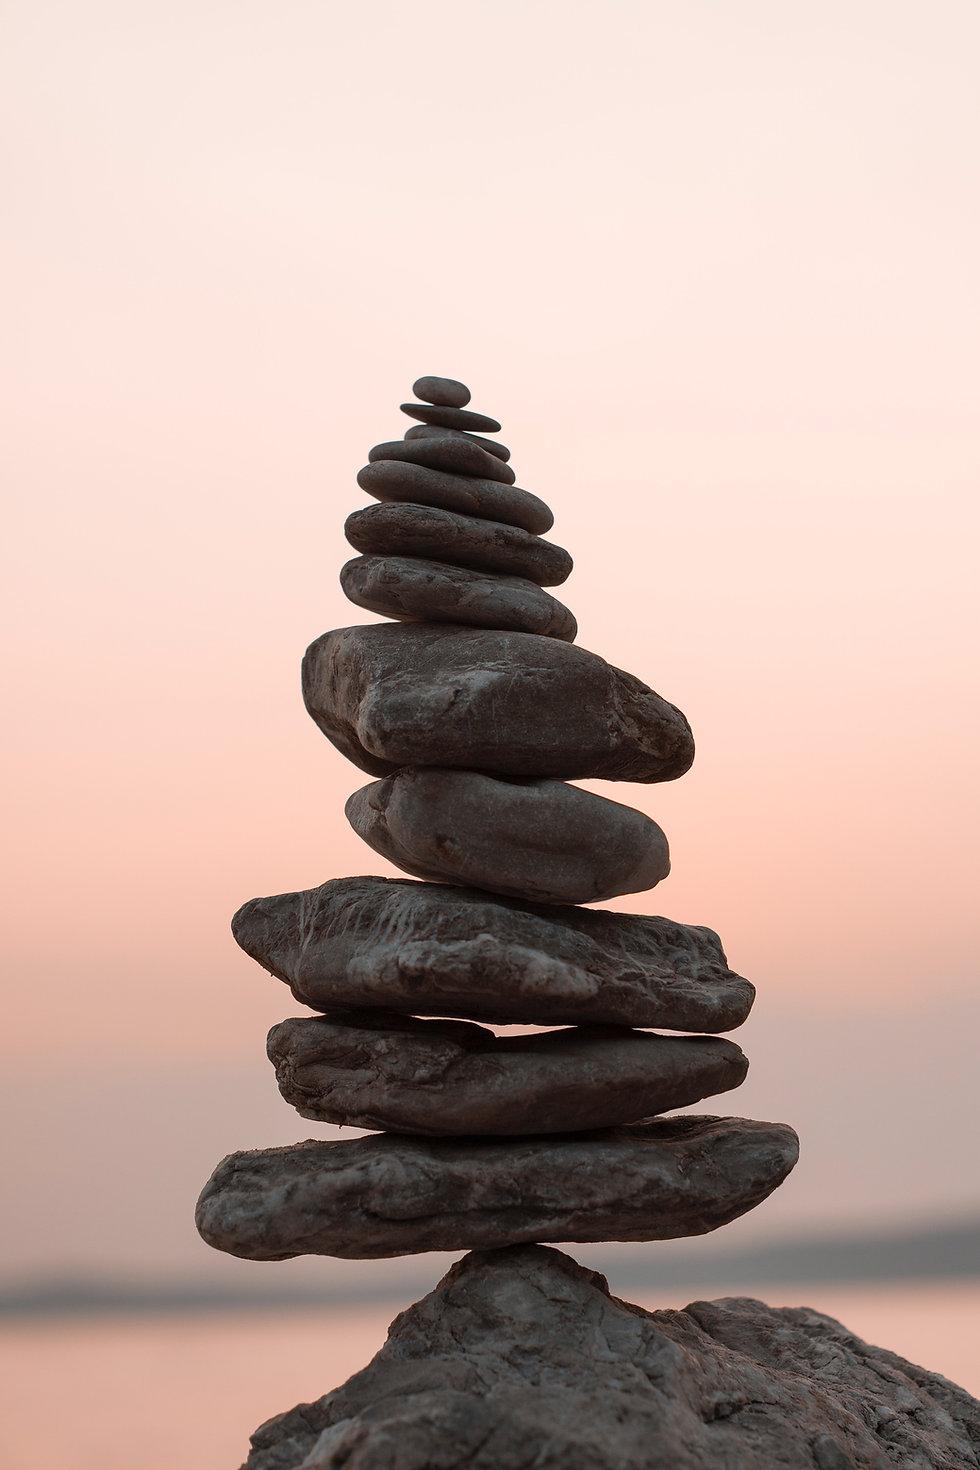 foto de pedras empilhadas representando equilíbrio